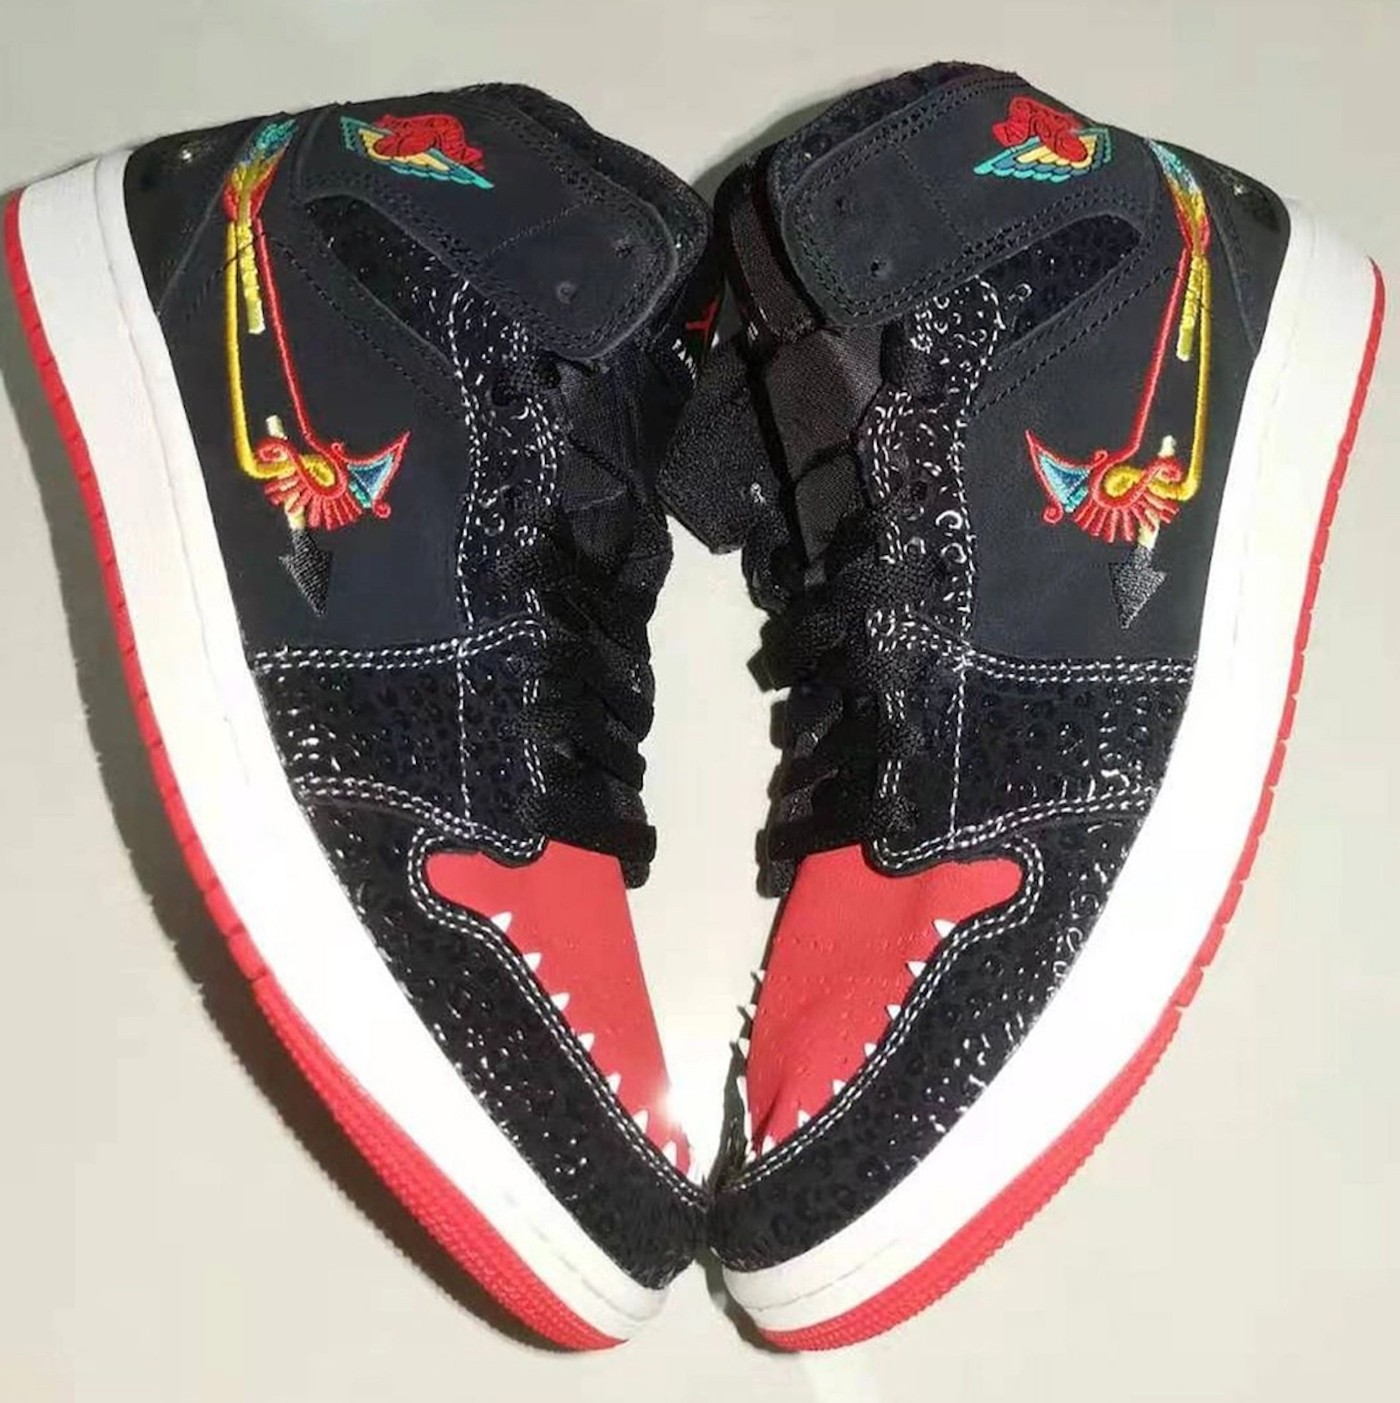 Air Jordan 1 Mid ,AJ1,Familia  亡灵节专属配色!全新 Air Jordan 1 Mid 实物图曝光!